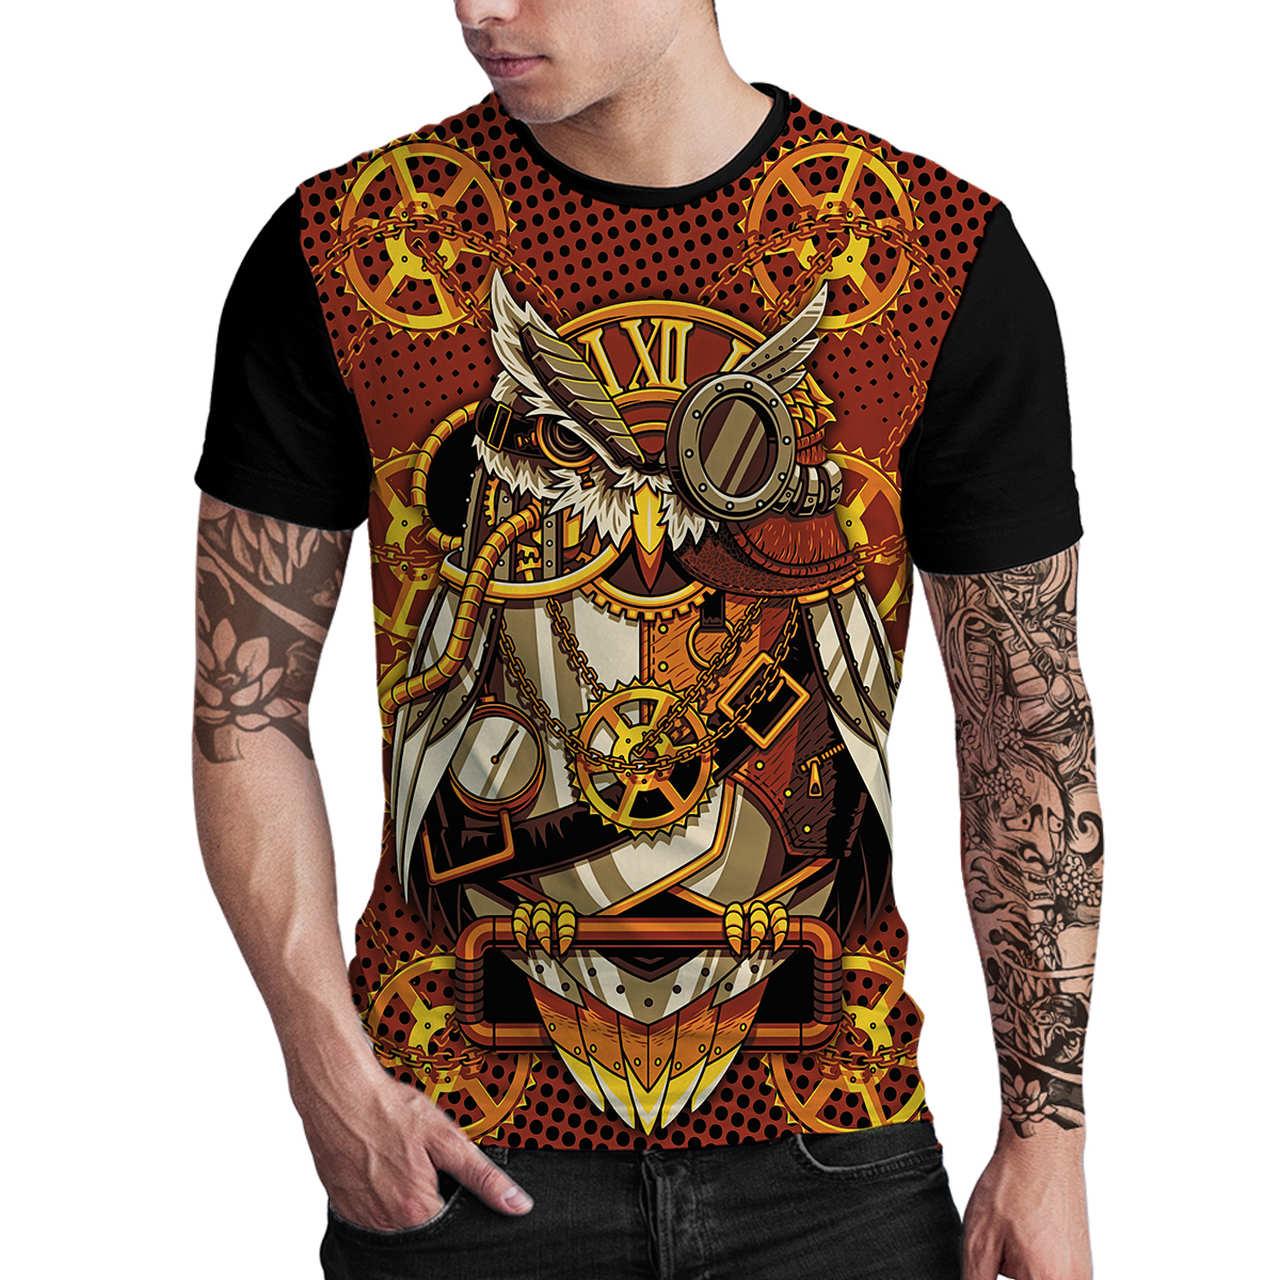 Stompy Camiseta Estampada Masculina Modelo 140